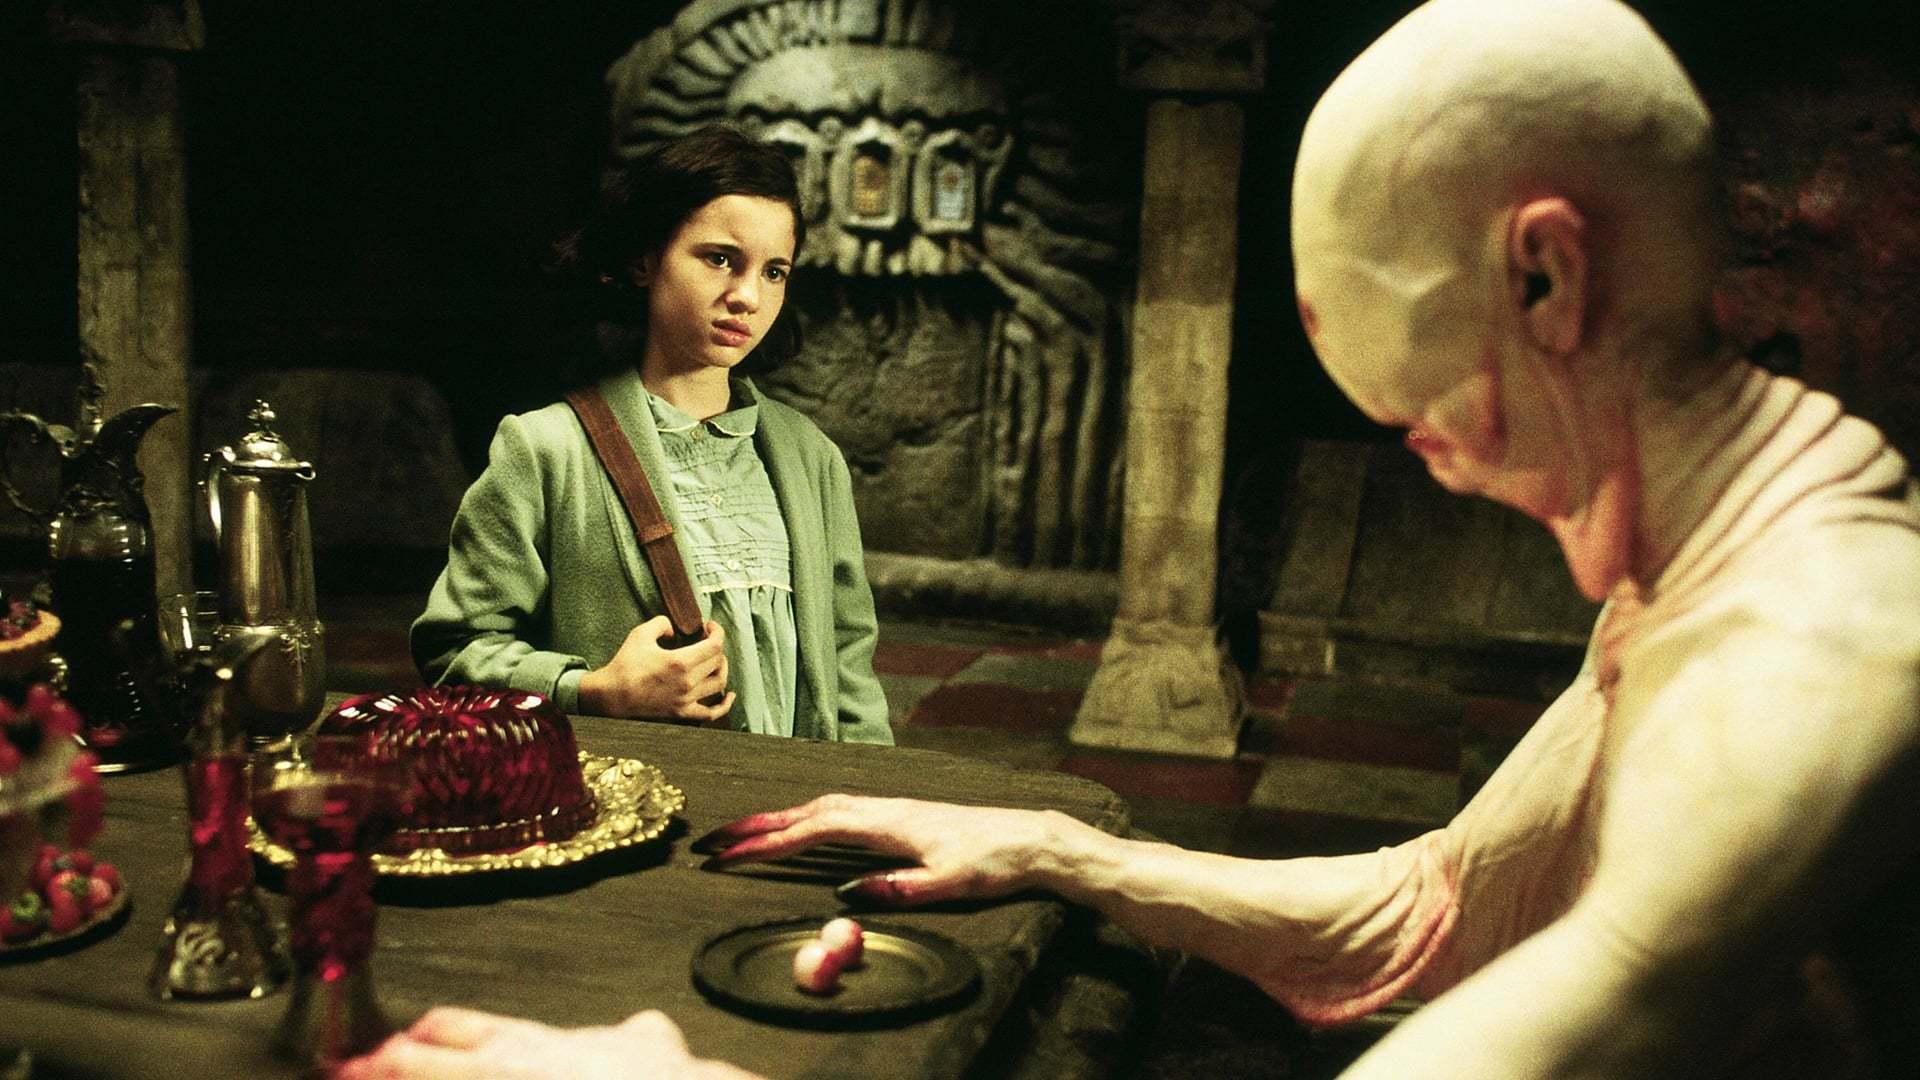 Кадры из фильма Лабиринт Фавна El laberinto del fauno 2006